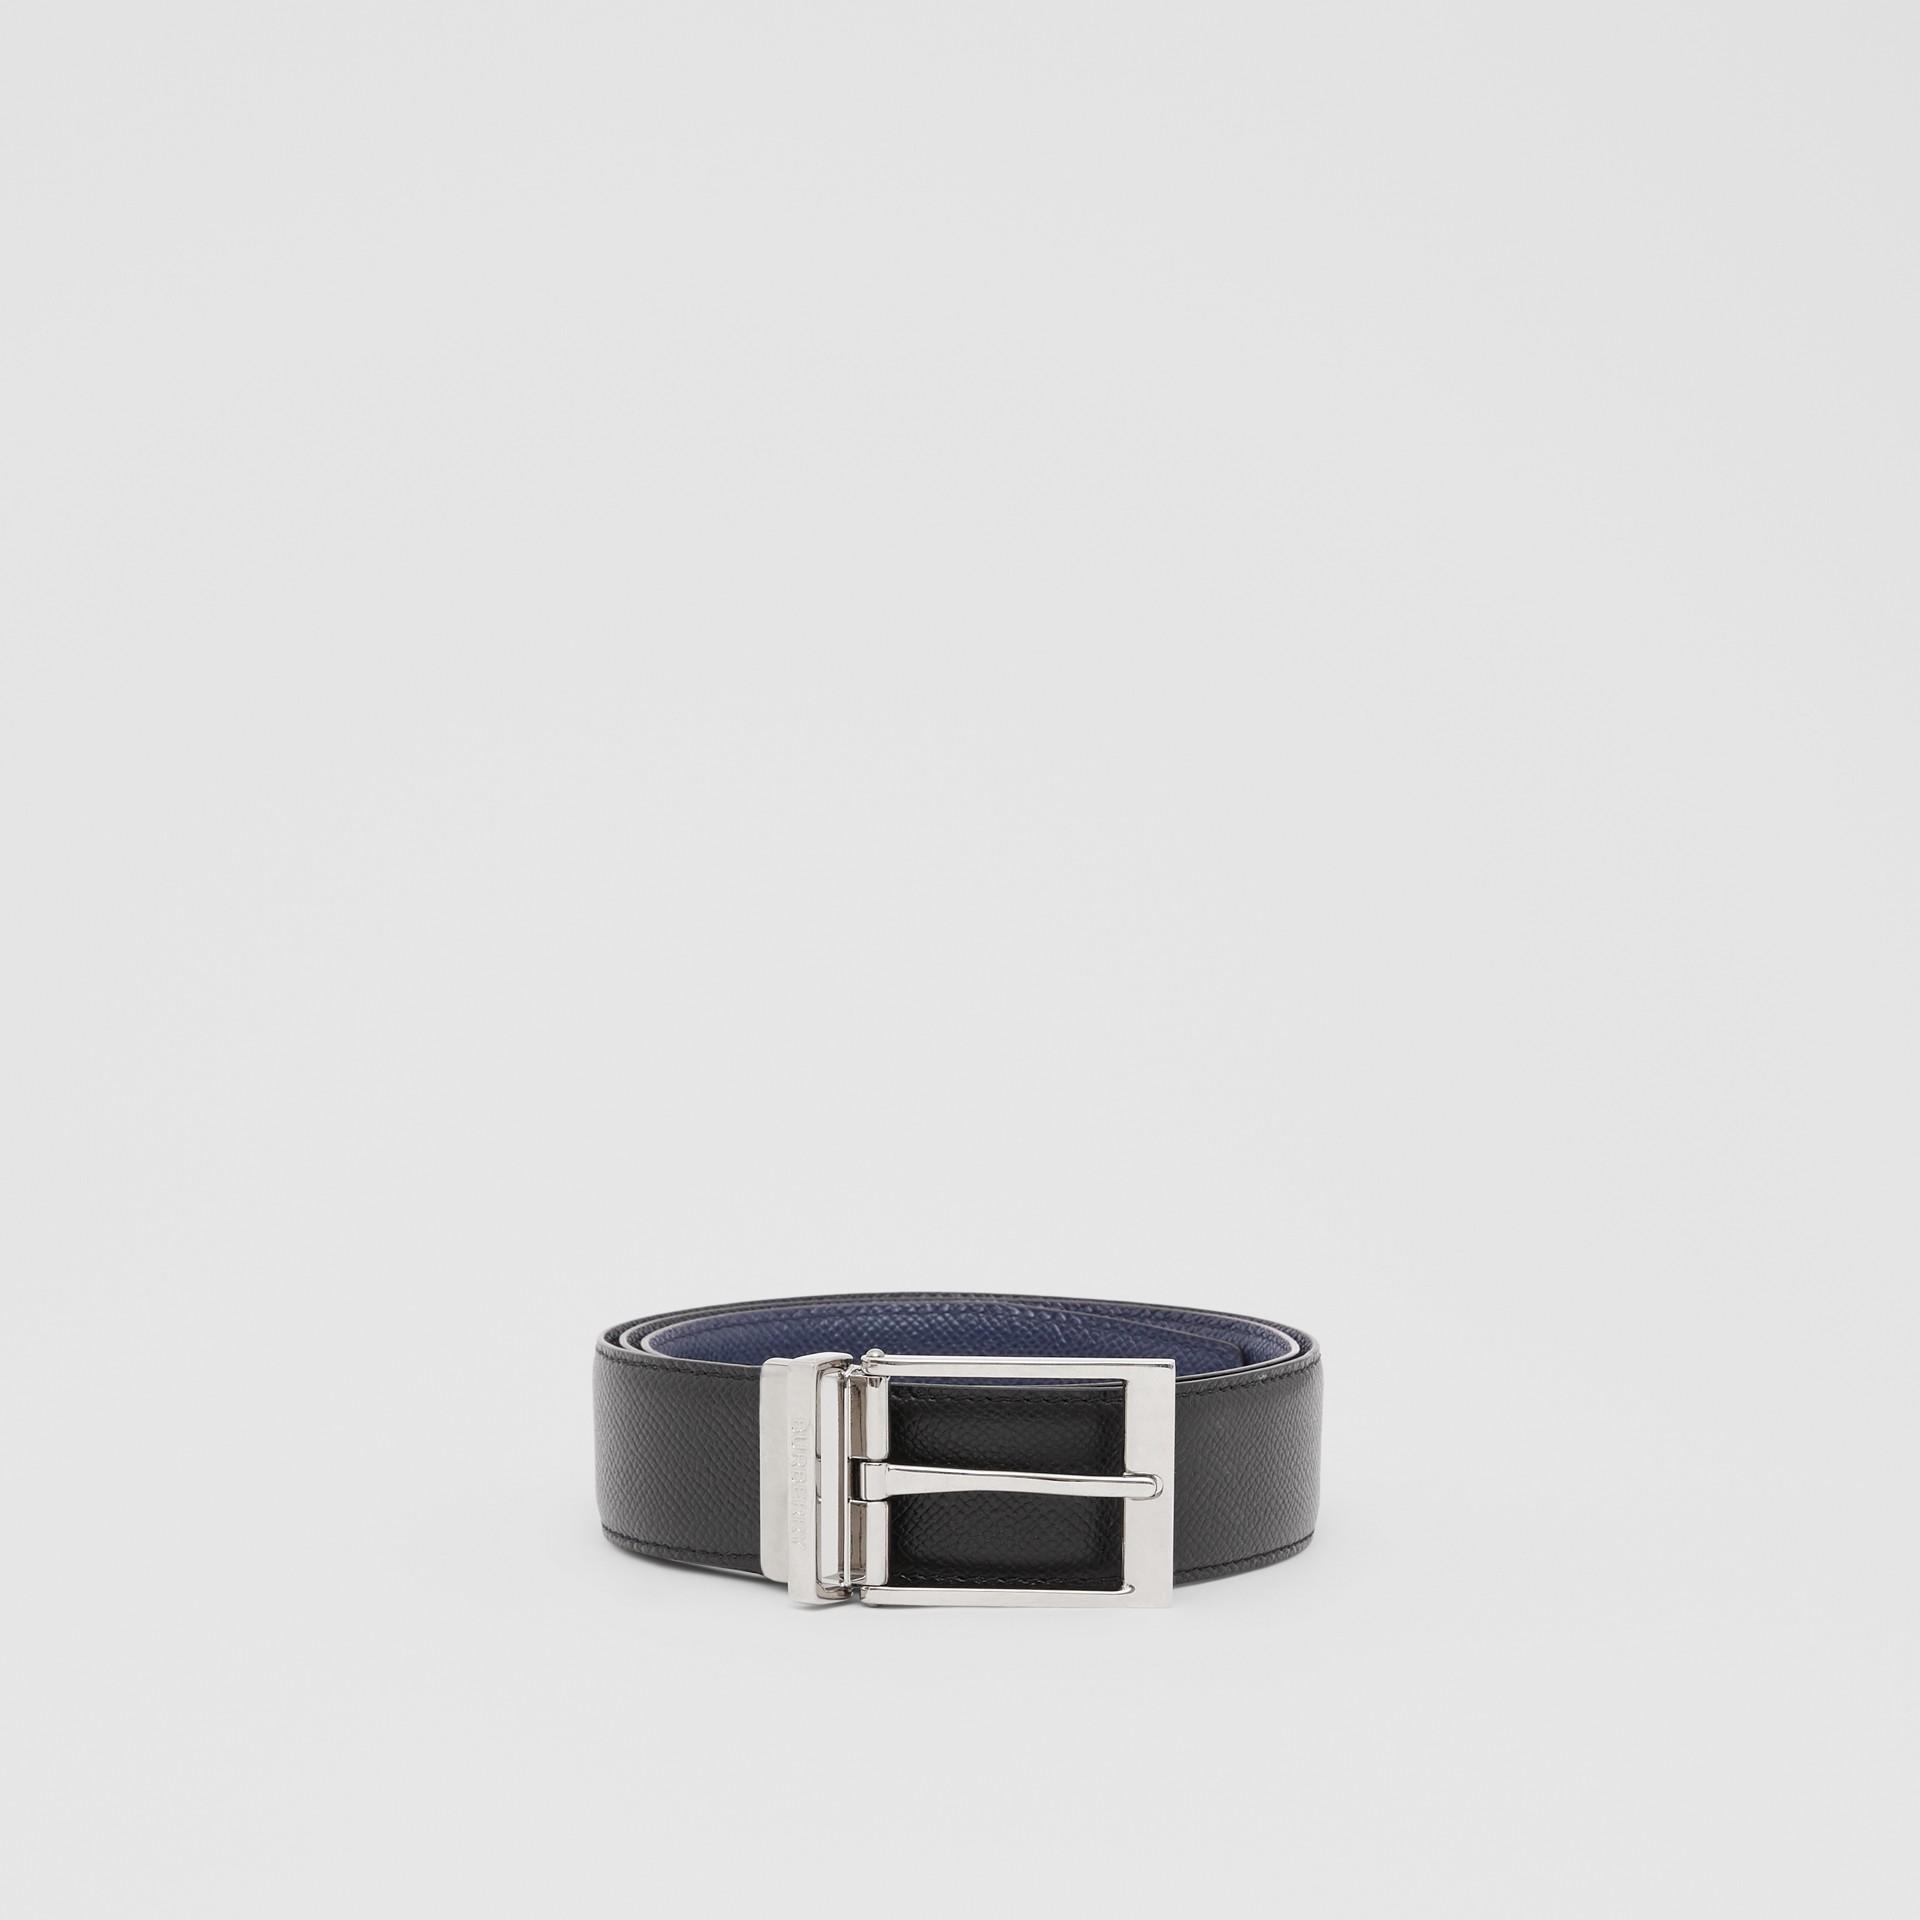 Reversible Grainy Leather Belt in Navy/black - Men | Burberry - gallery image 3